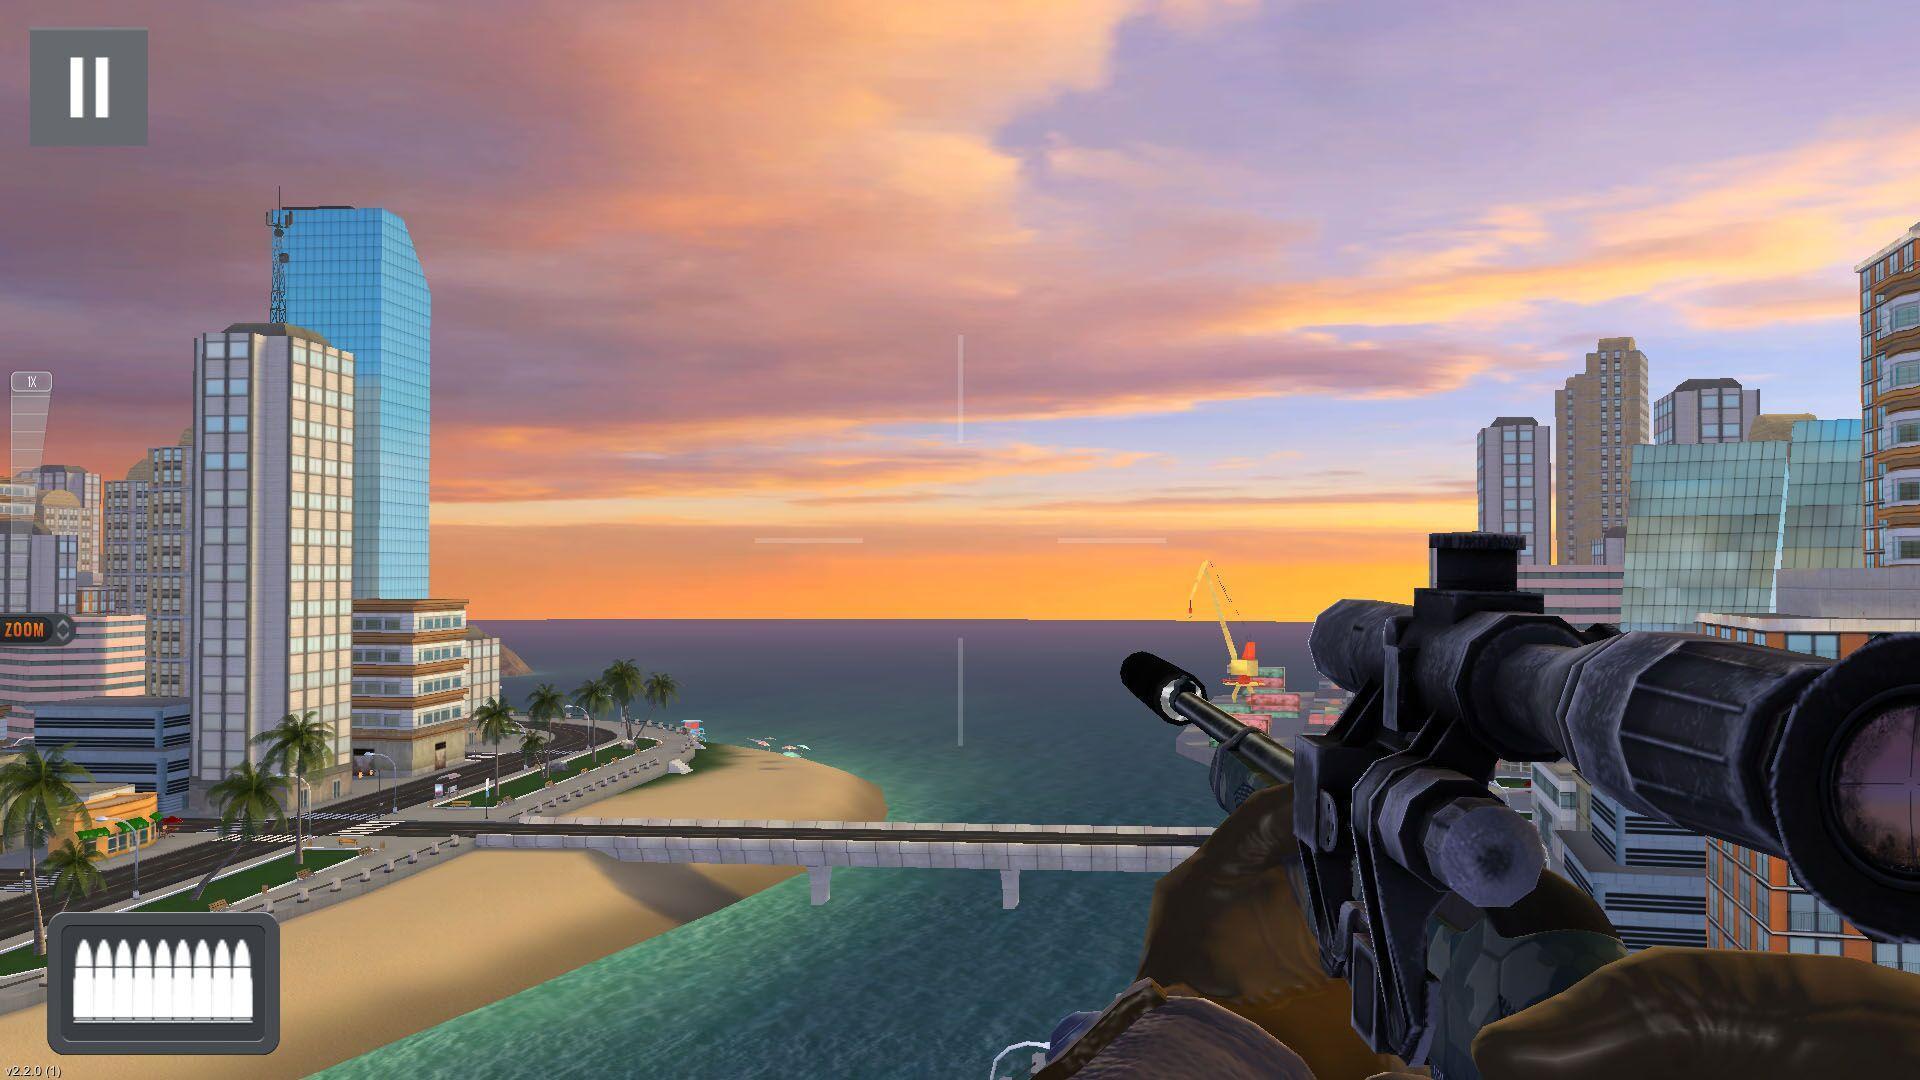 Sniper 3D Fun Free Online FPS Shooting Game 3.15.1 Screenshot 16